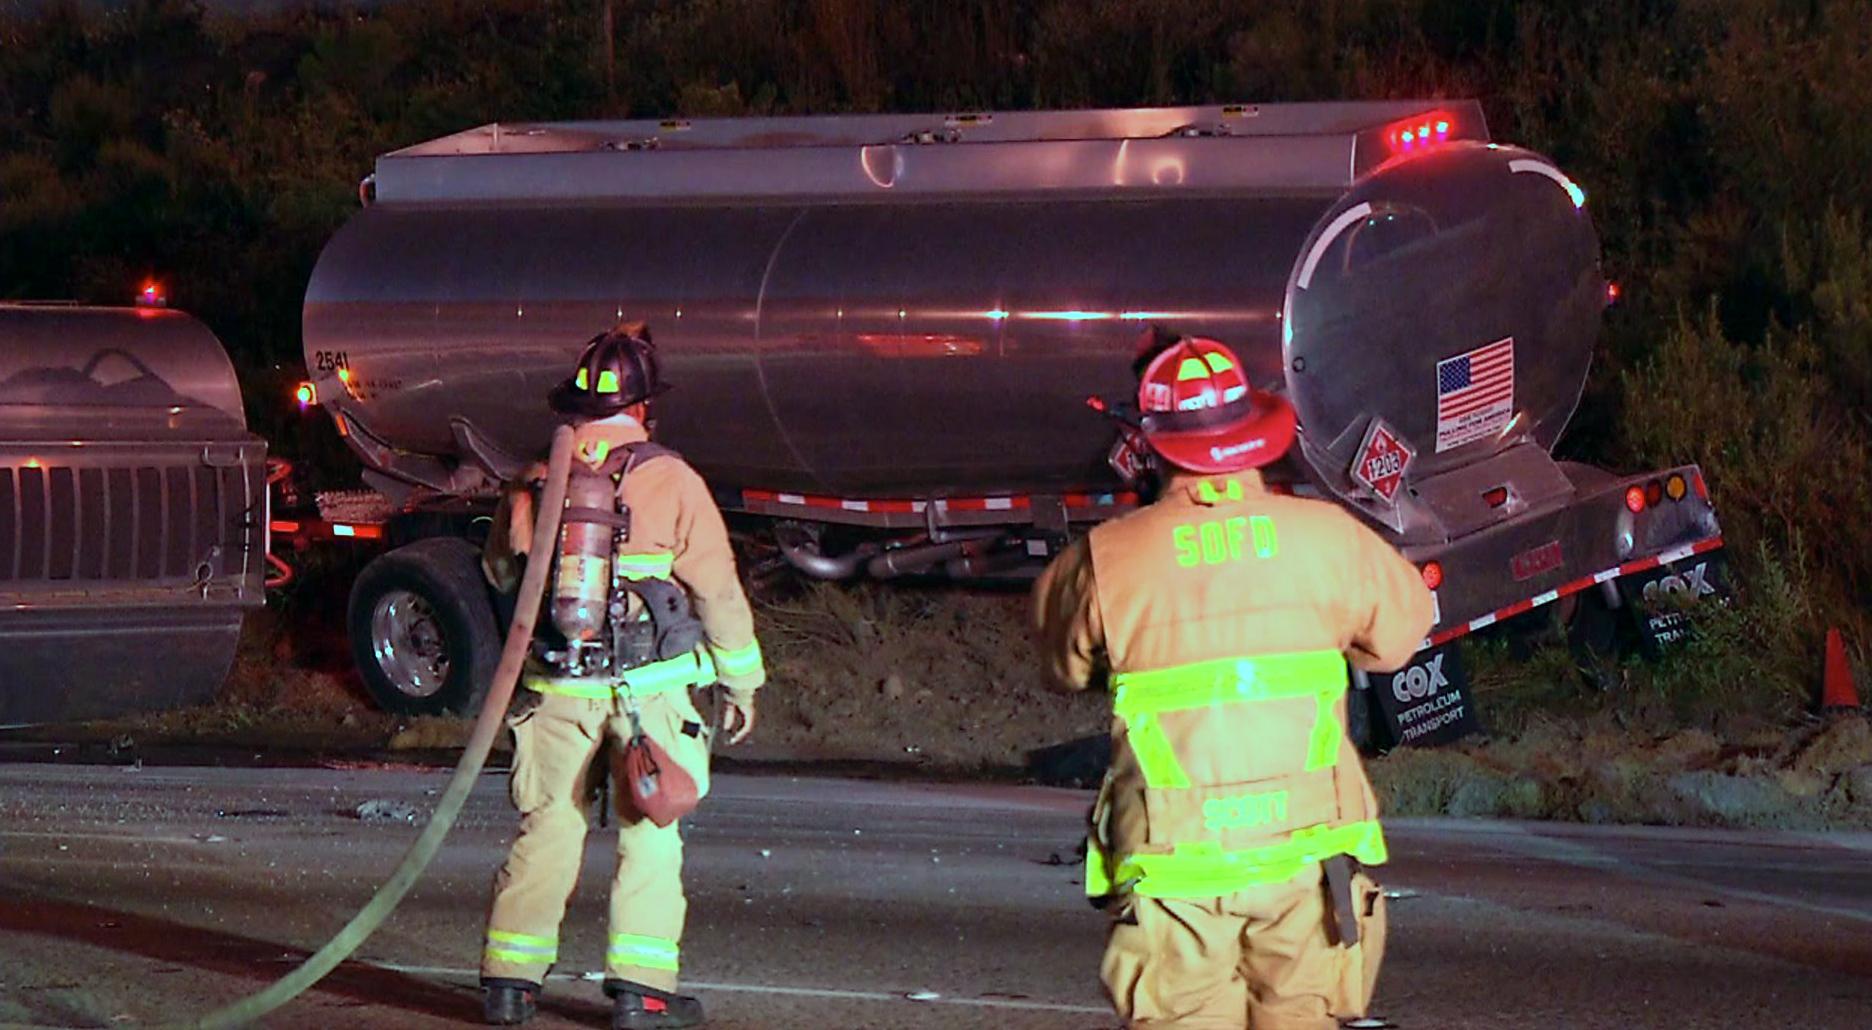 I-15 Fuel Tanker Spill